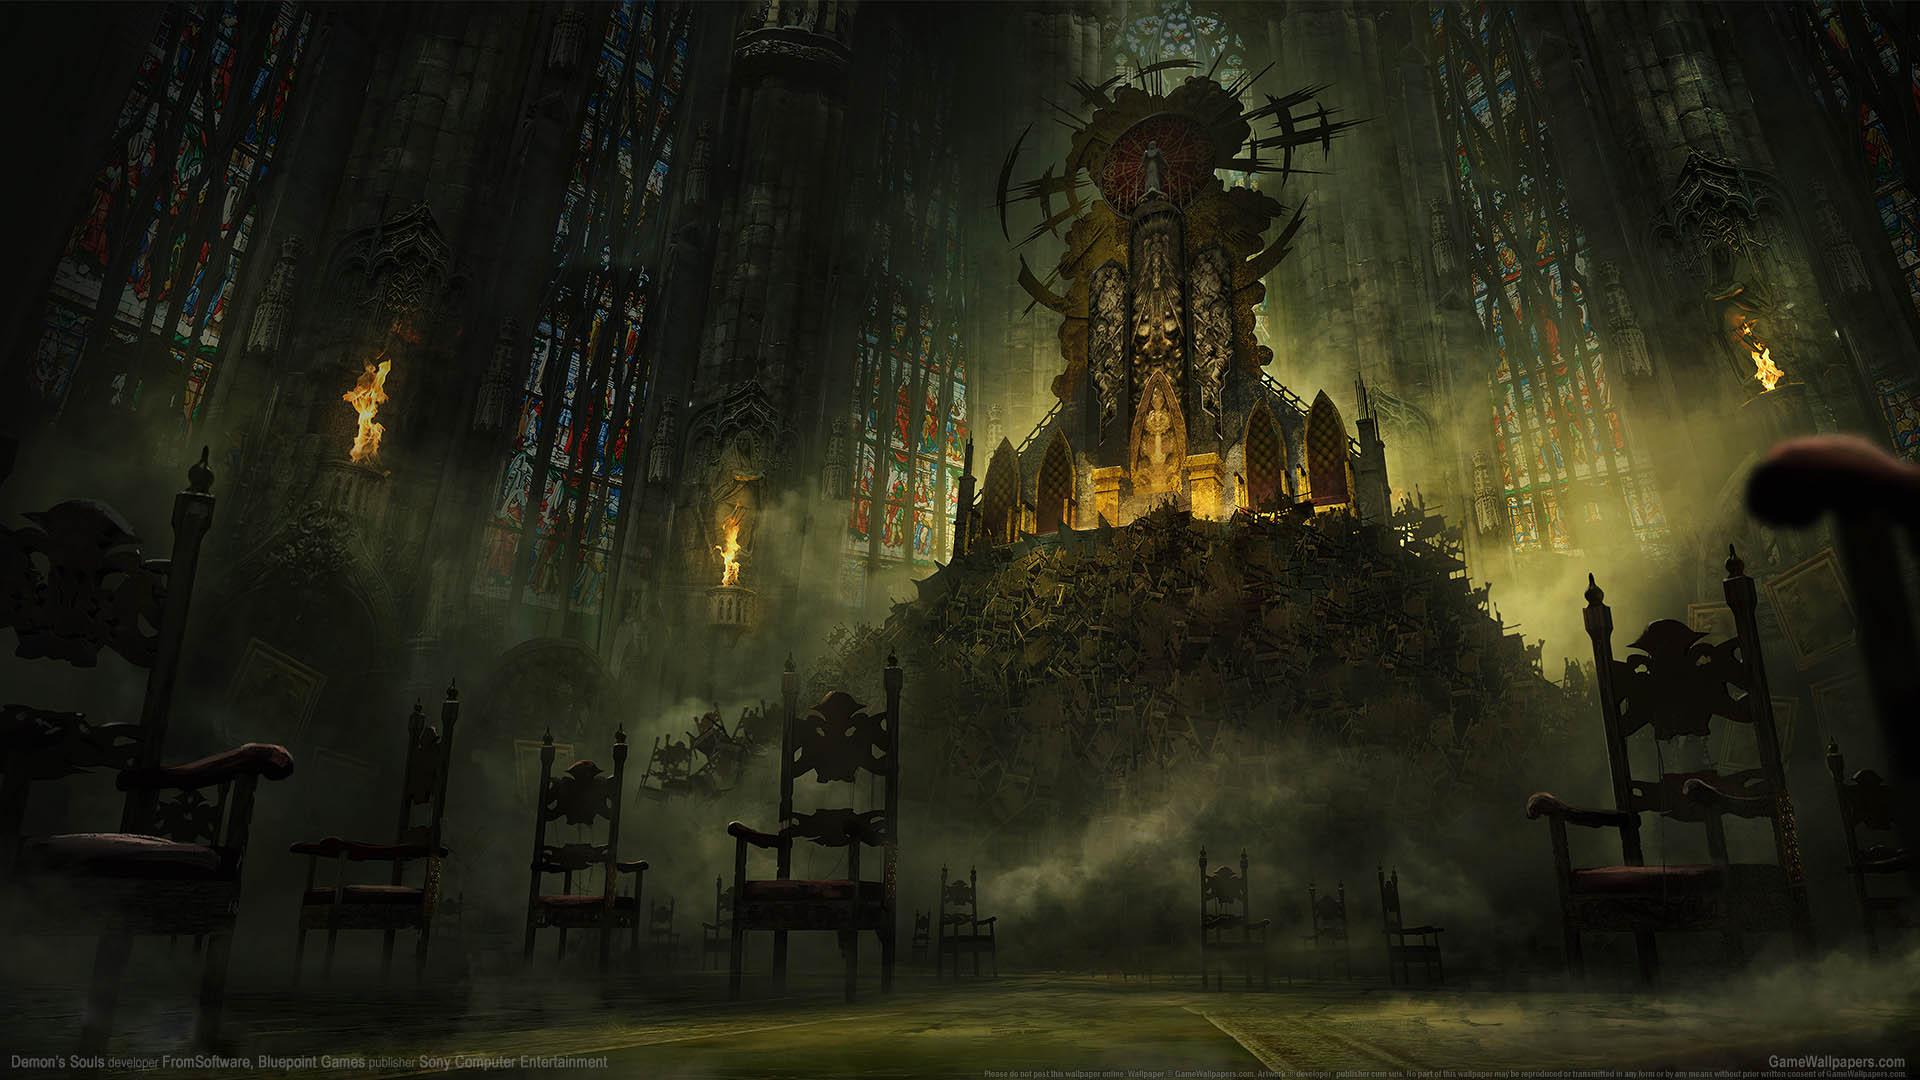 Demon's Souls 2020 fondo de escritorio 03 1920x1080